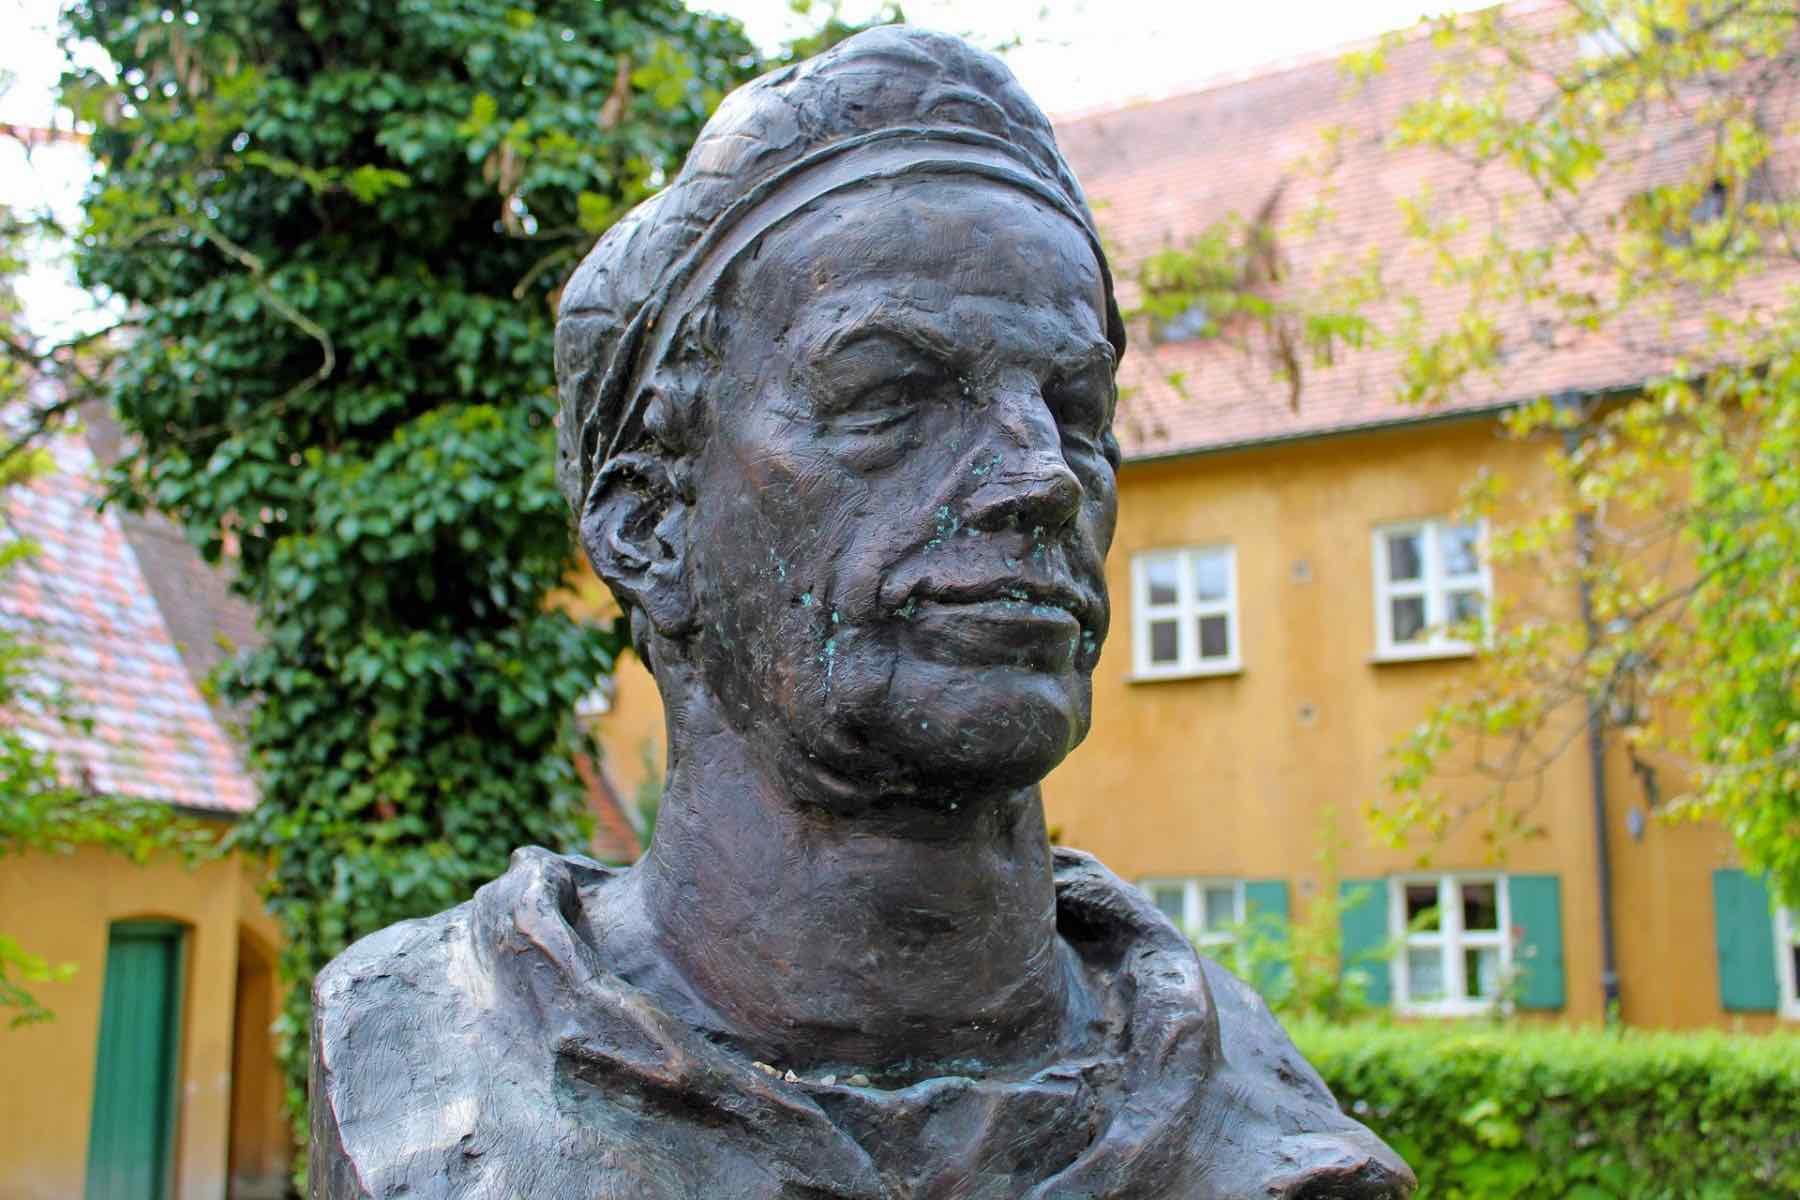 Geheimtipp Augsburg Függerei1 – ©Pixabay